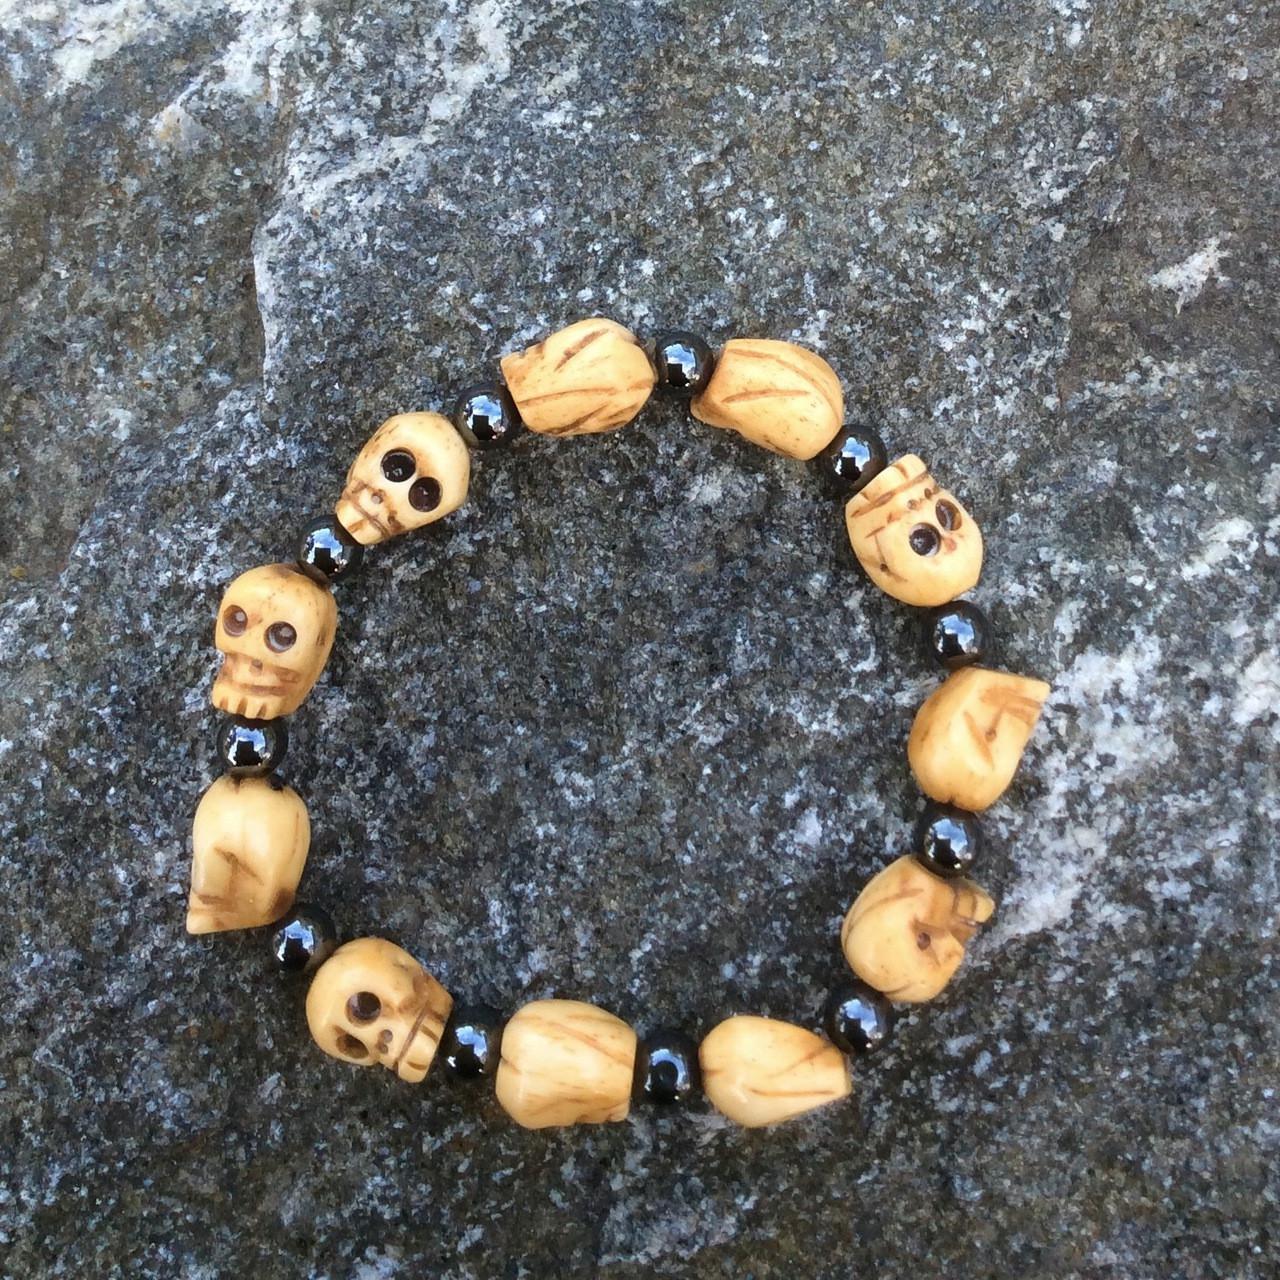 Skull Bracelet Of Bone And Hematite 11 Carved Bone Skulls And 11 Round Hematite Beads Stretch Cord Tri Tone Arts Adornments